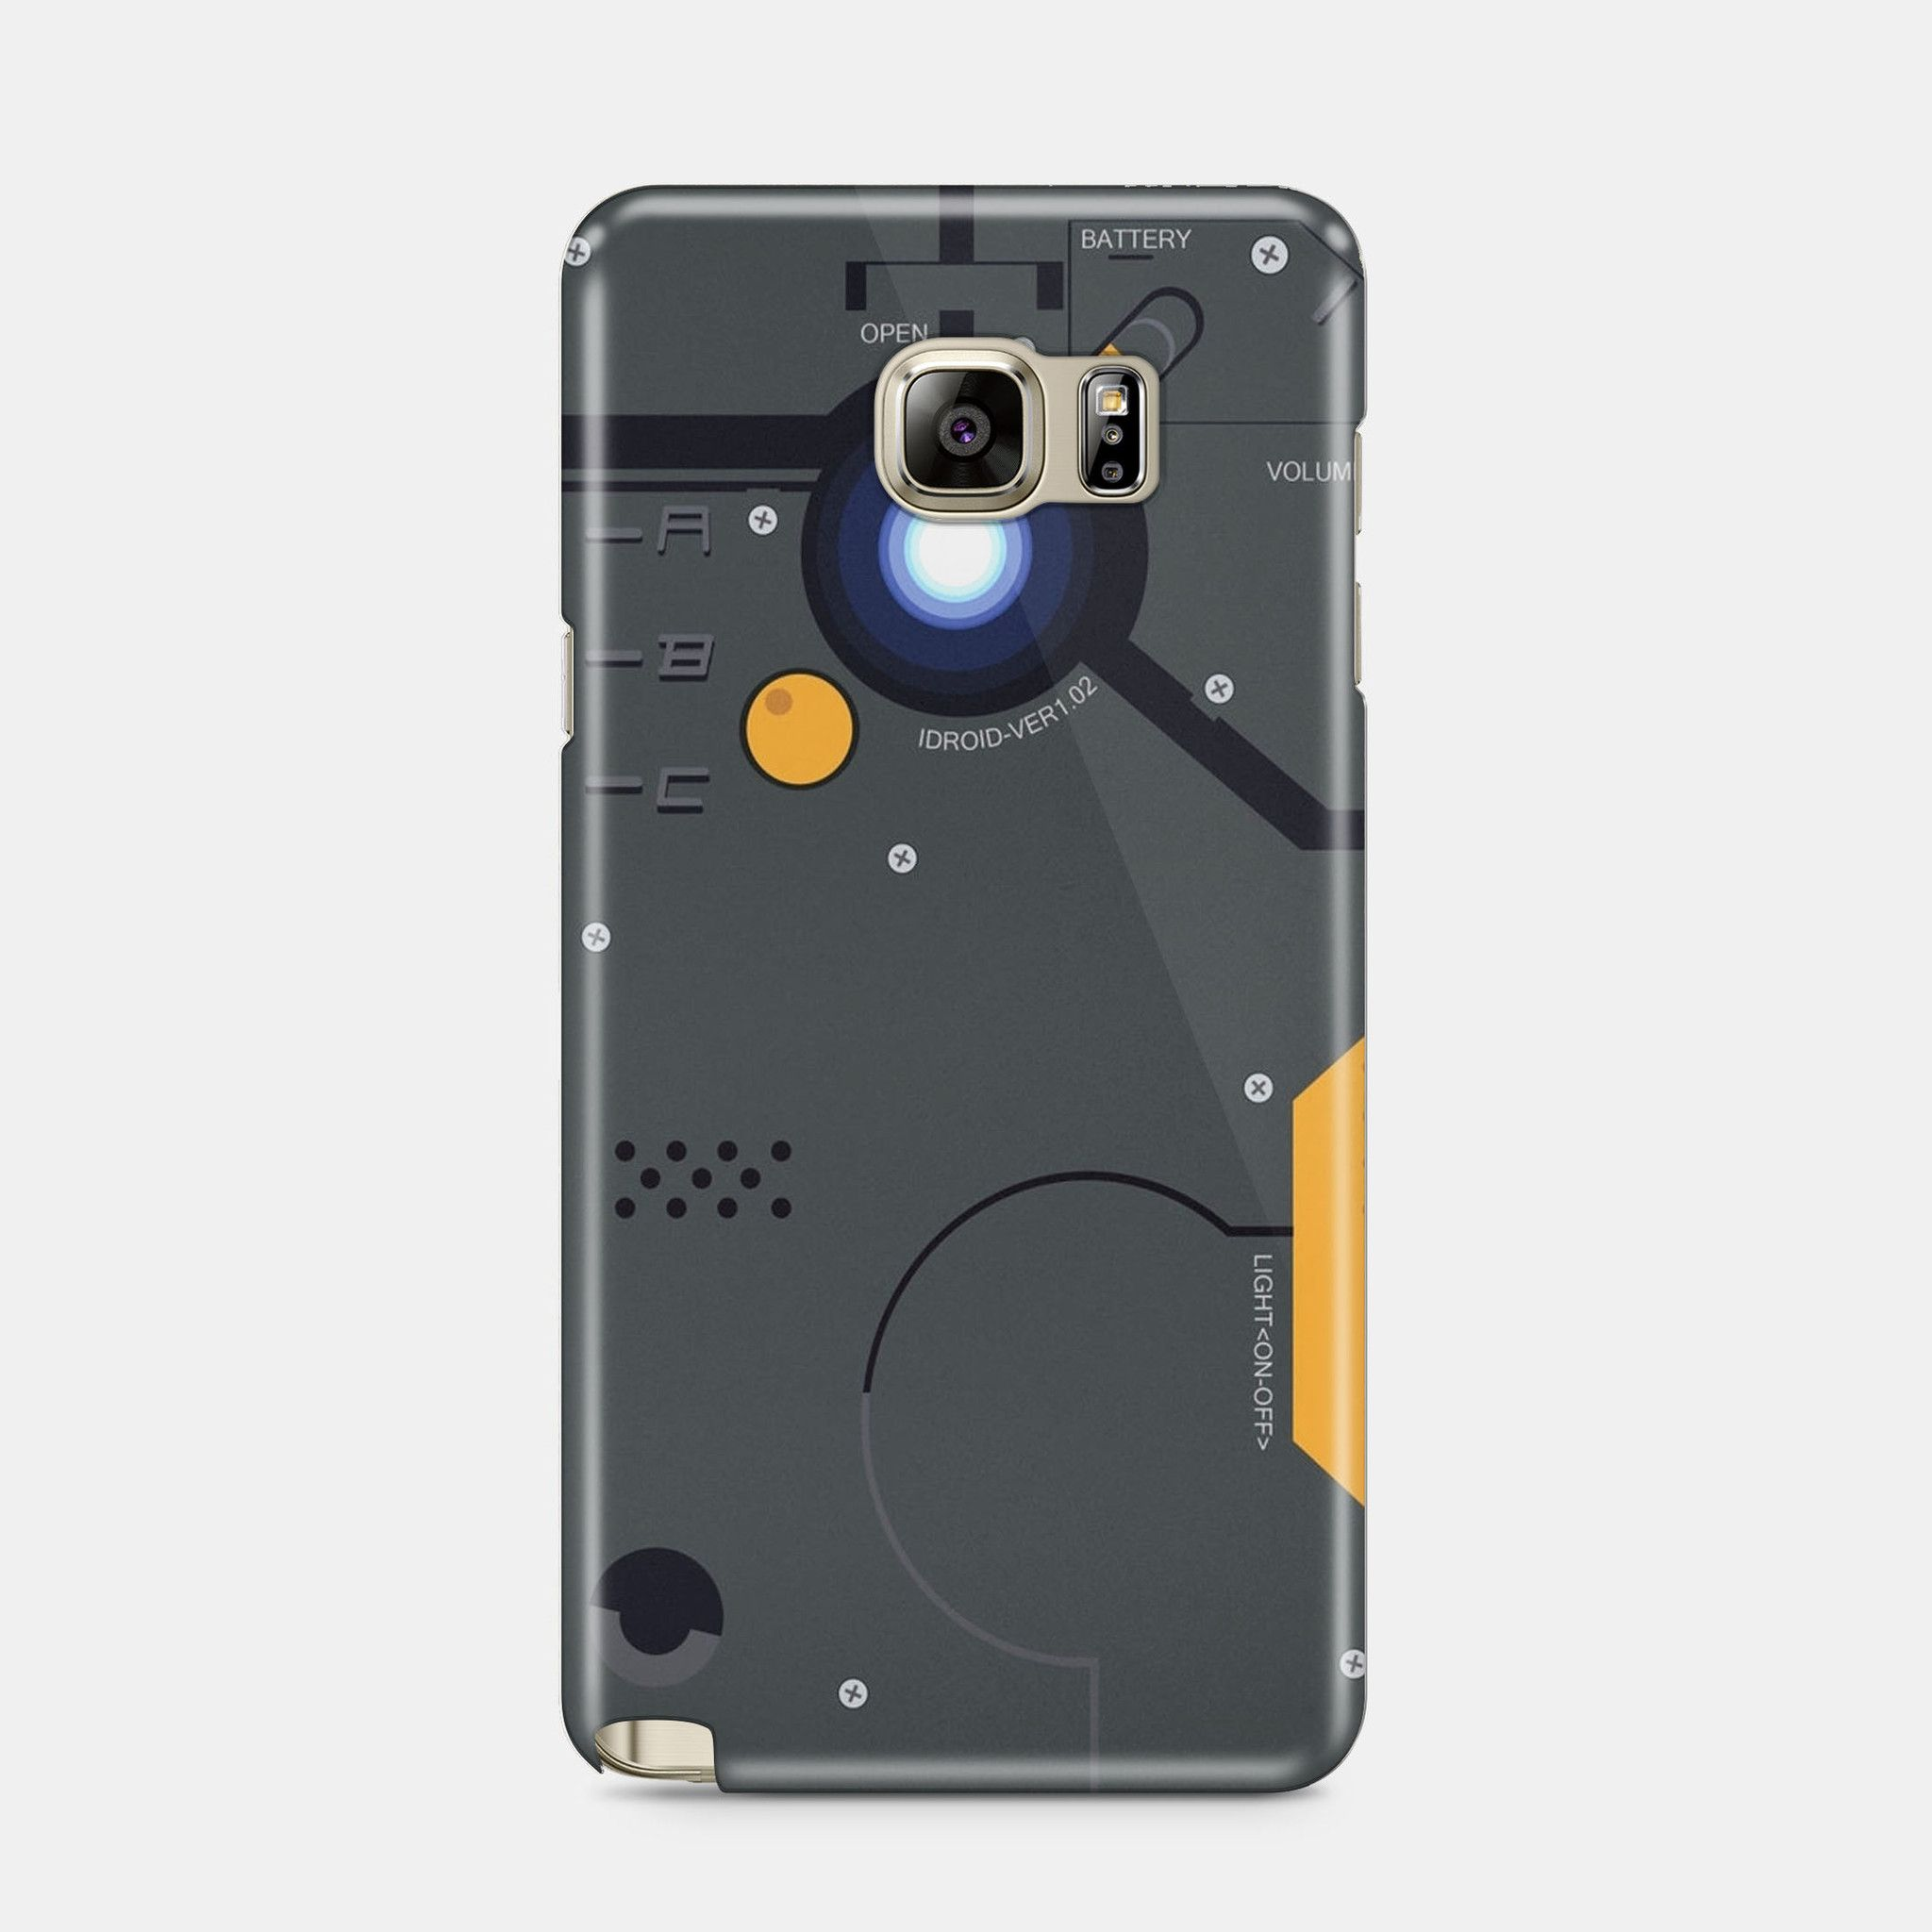 Buy Metal Gear Solid 5 iDroid Samsung Galaxy S5 S6 S7 Edge